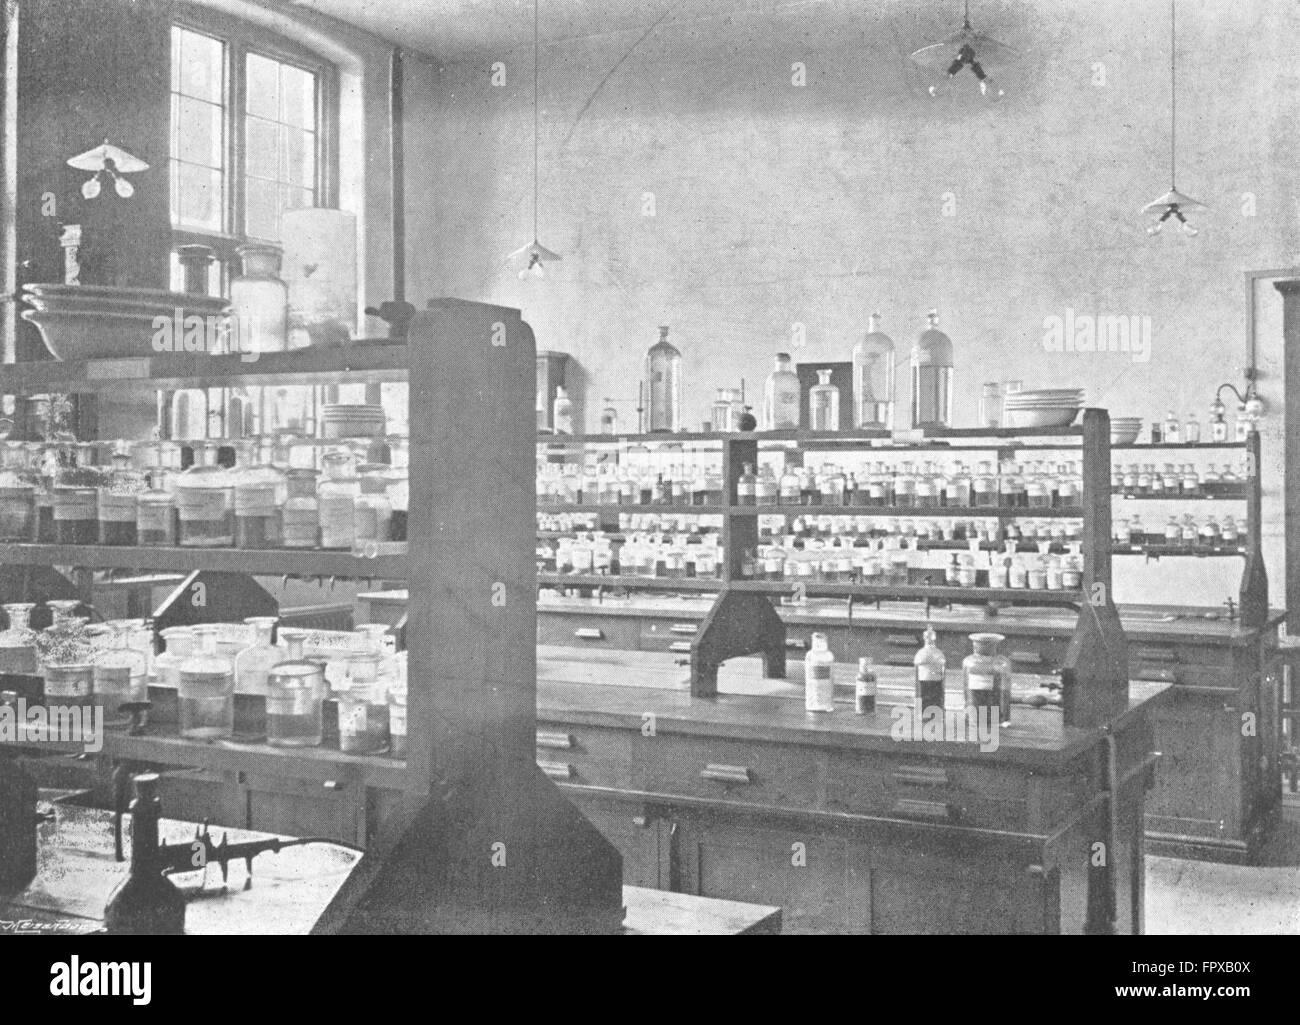 WORCESTER: Victoria Inst, Chemistry Science School, antique print c1900 - Stock Image